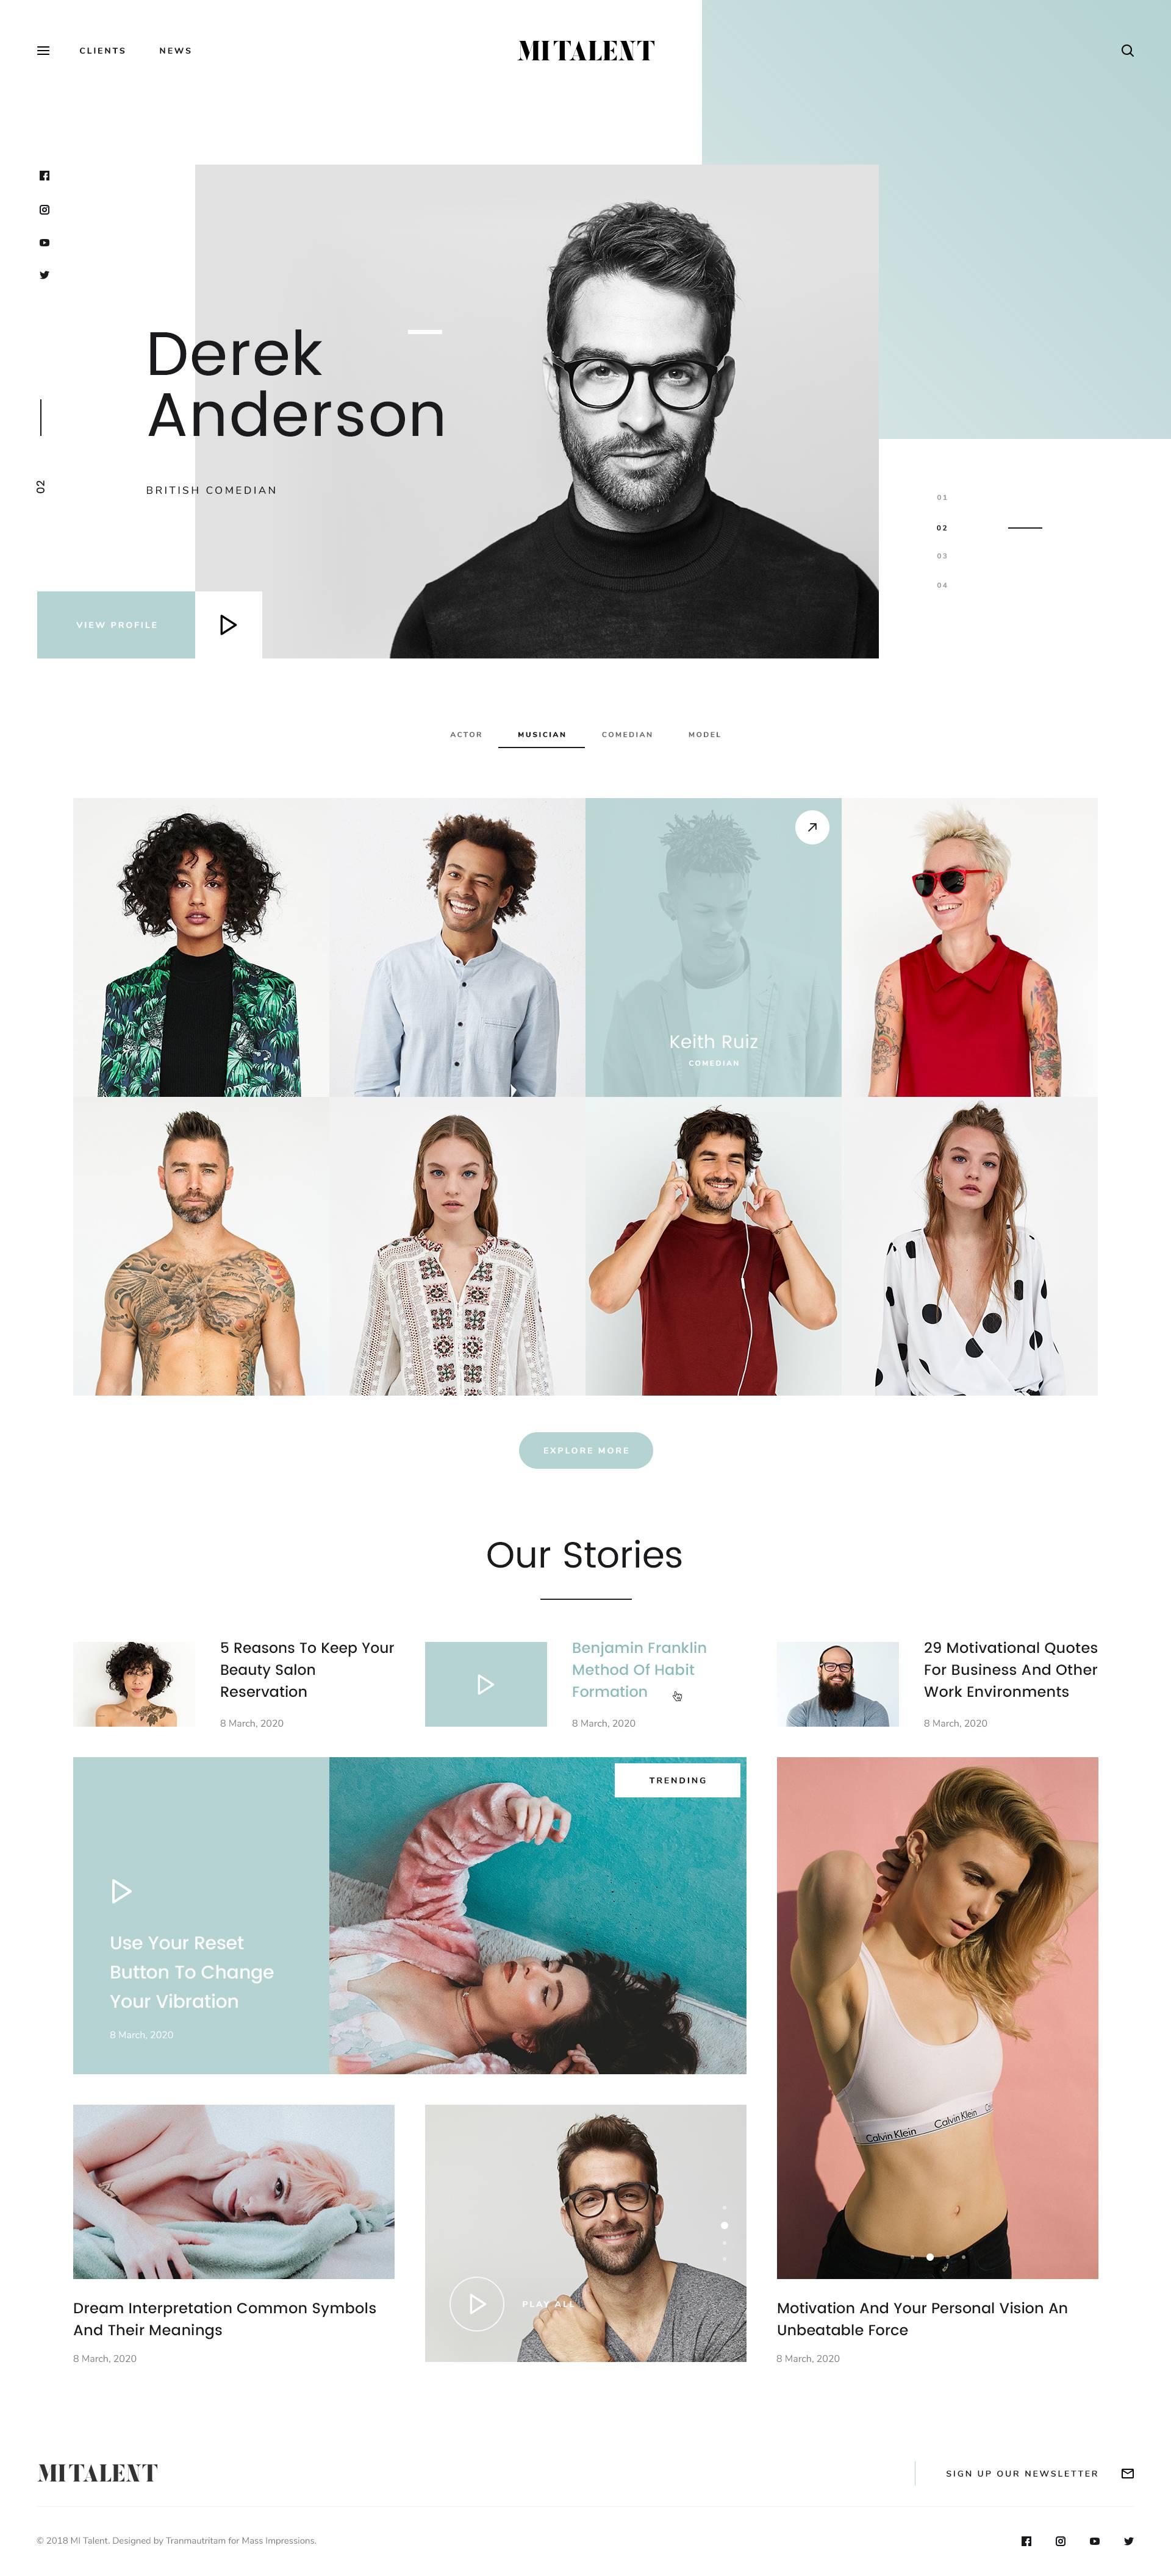 MITALENT网站UI界面设计 .psd素材下载 网页模板-第2张